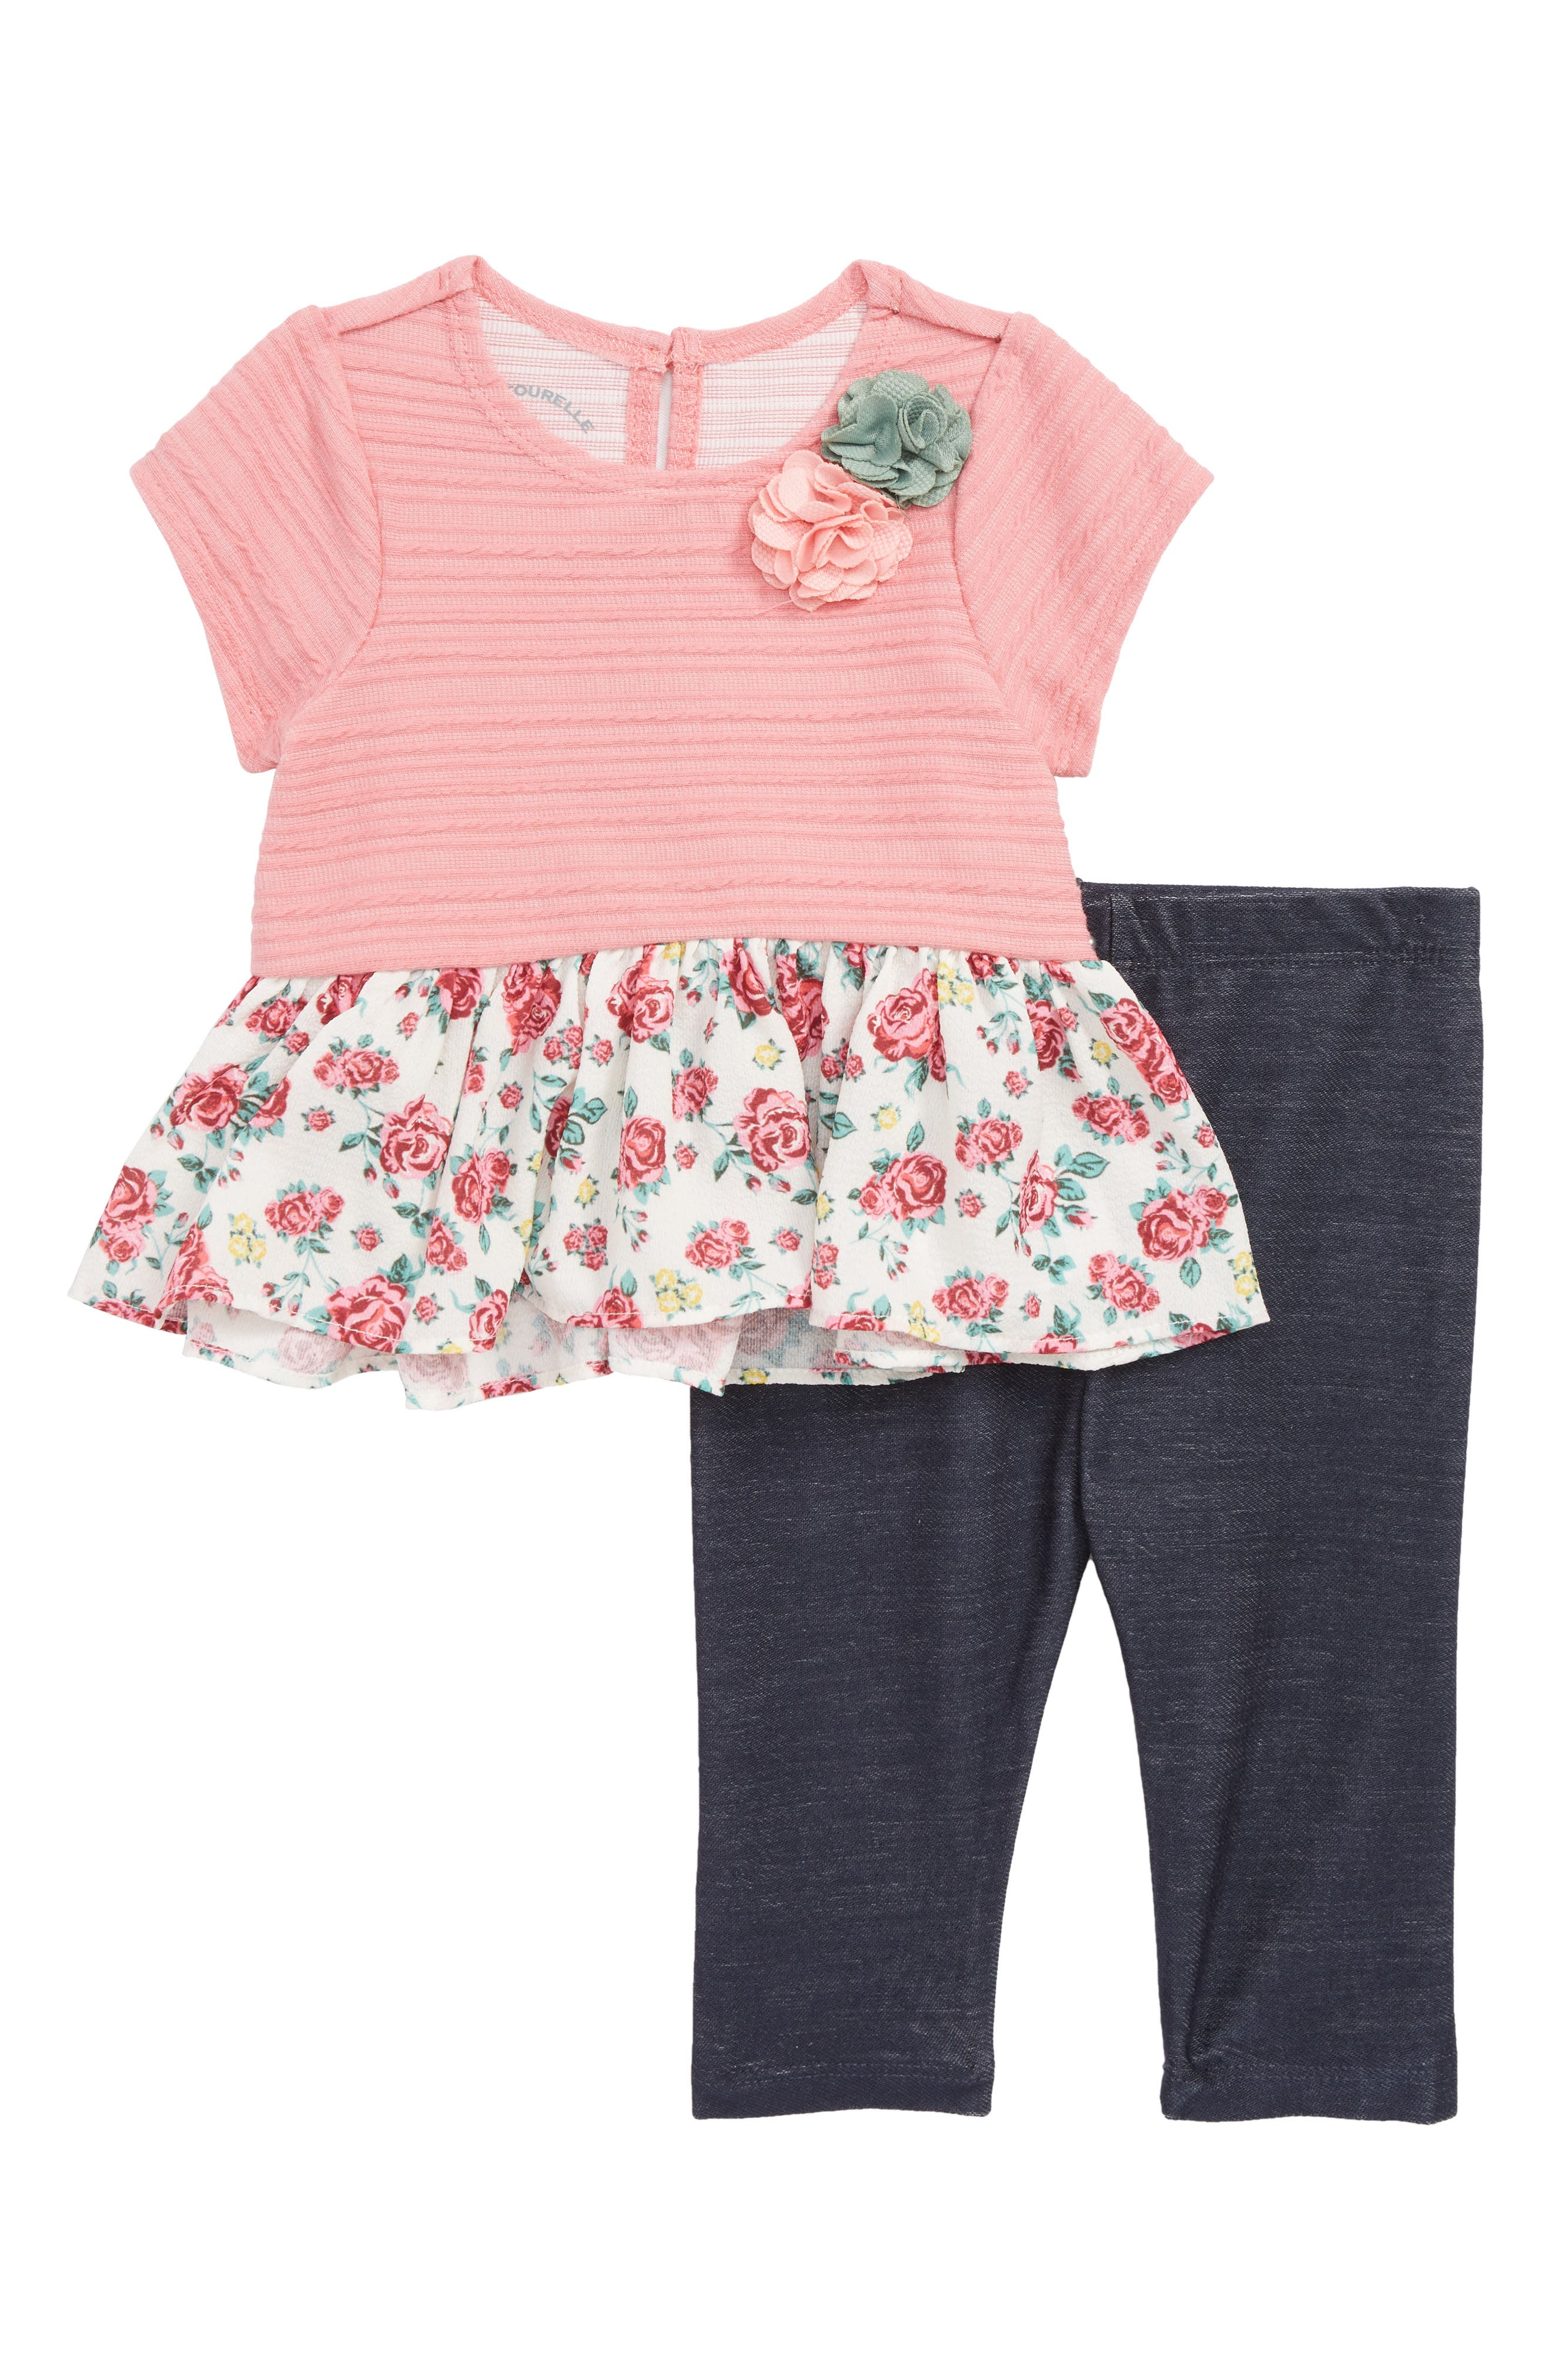 Floral Peplum Dress & Leggings Set,                             Main thumbnail 1, color,                             650